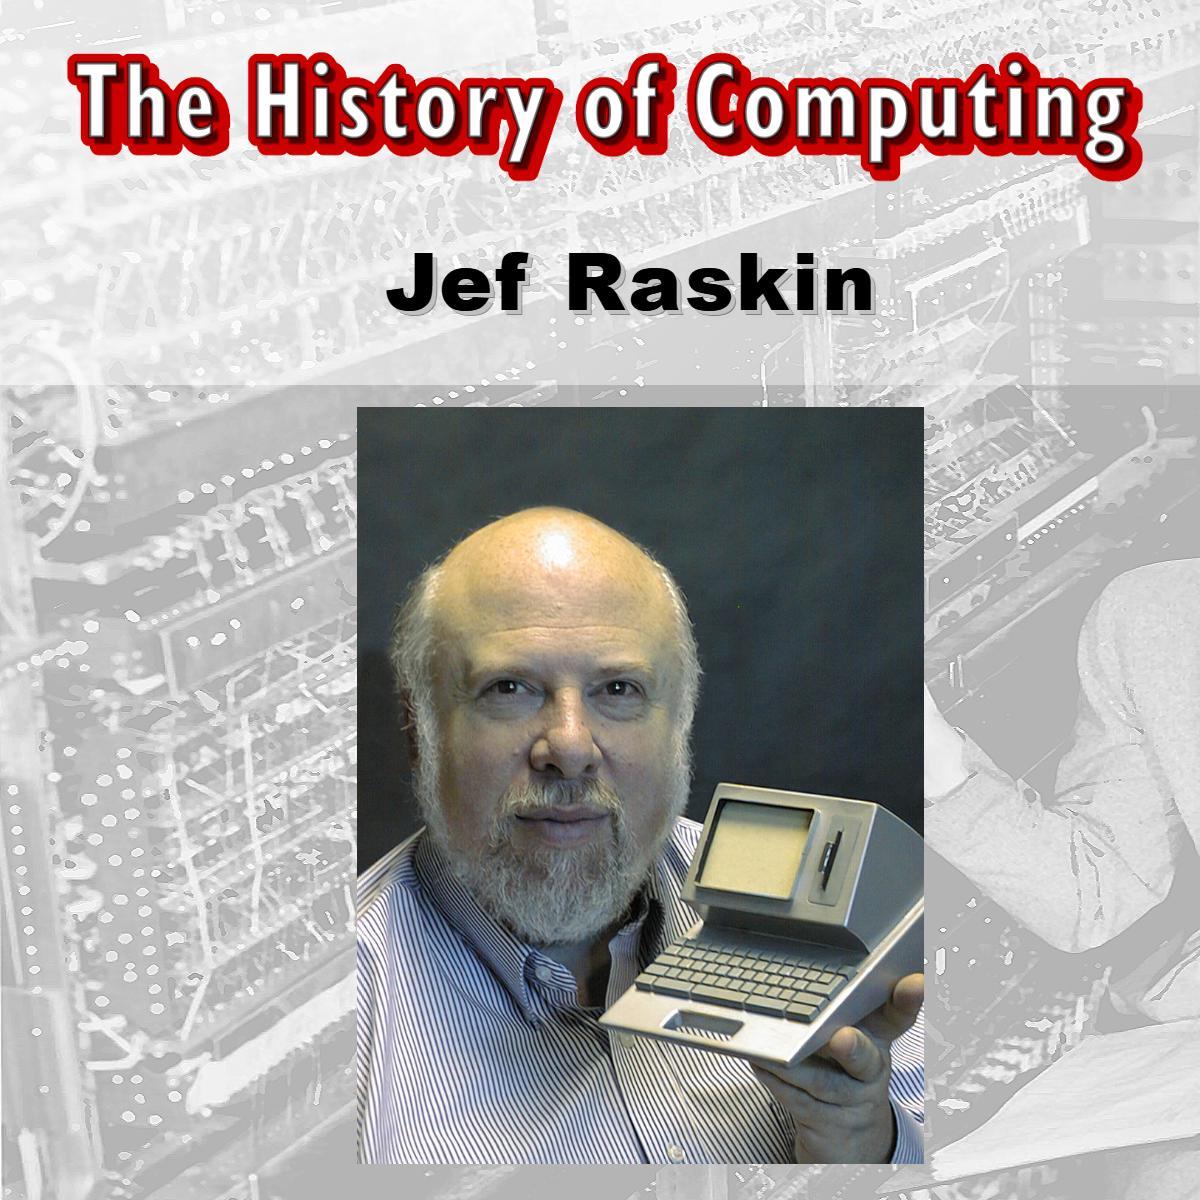 Jef Raskin